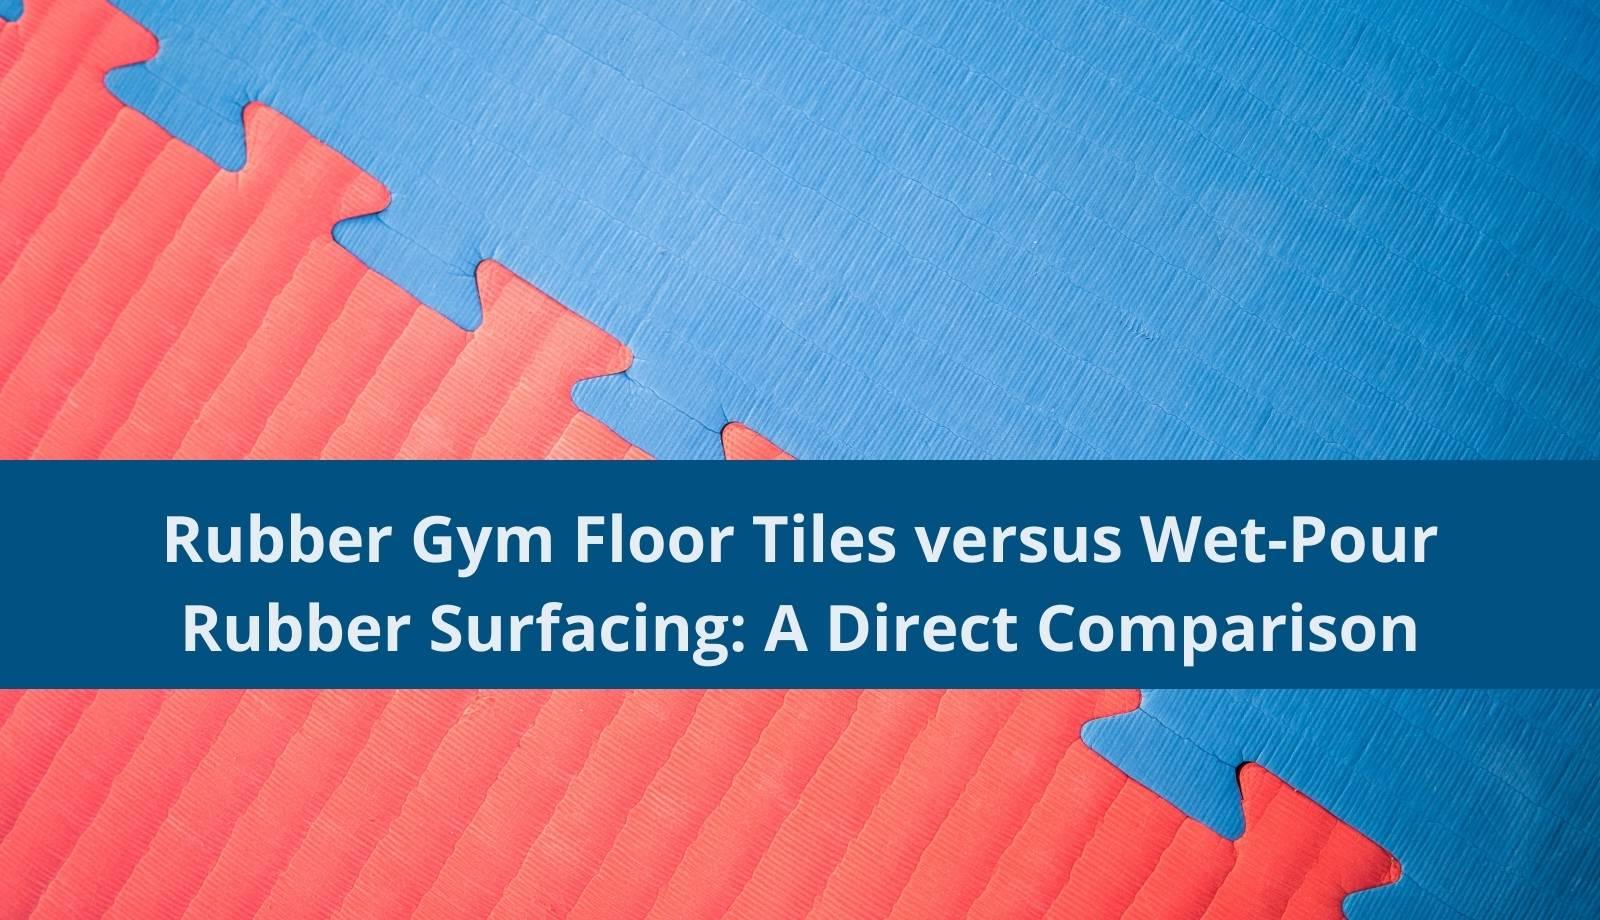 Rubber Gym Floor Tiles versus Wet-Pour Rubber Surfacing